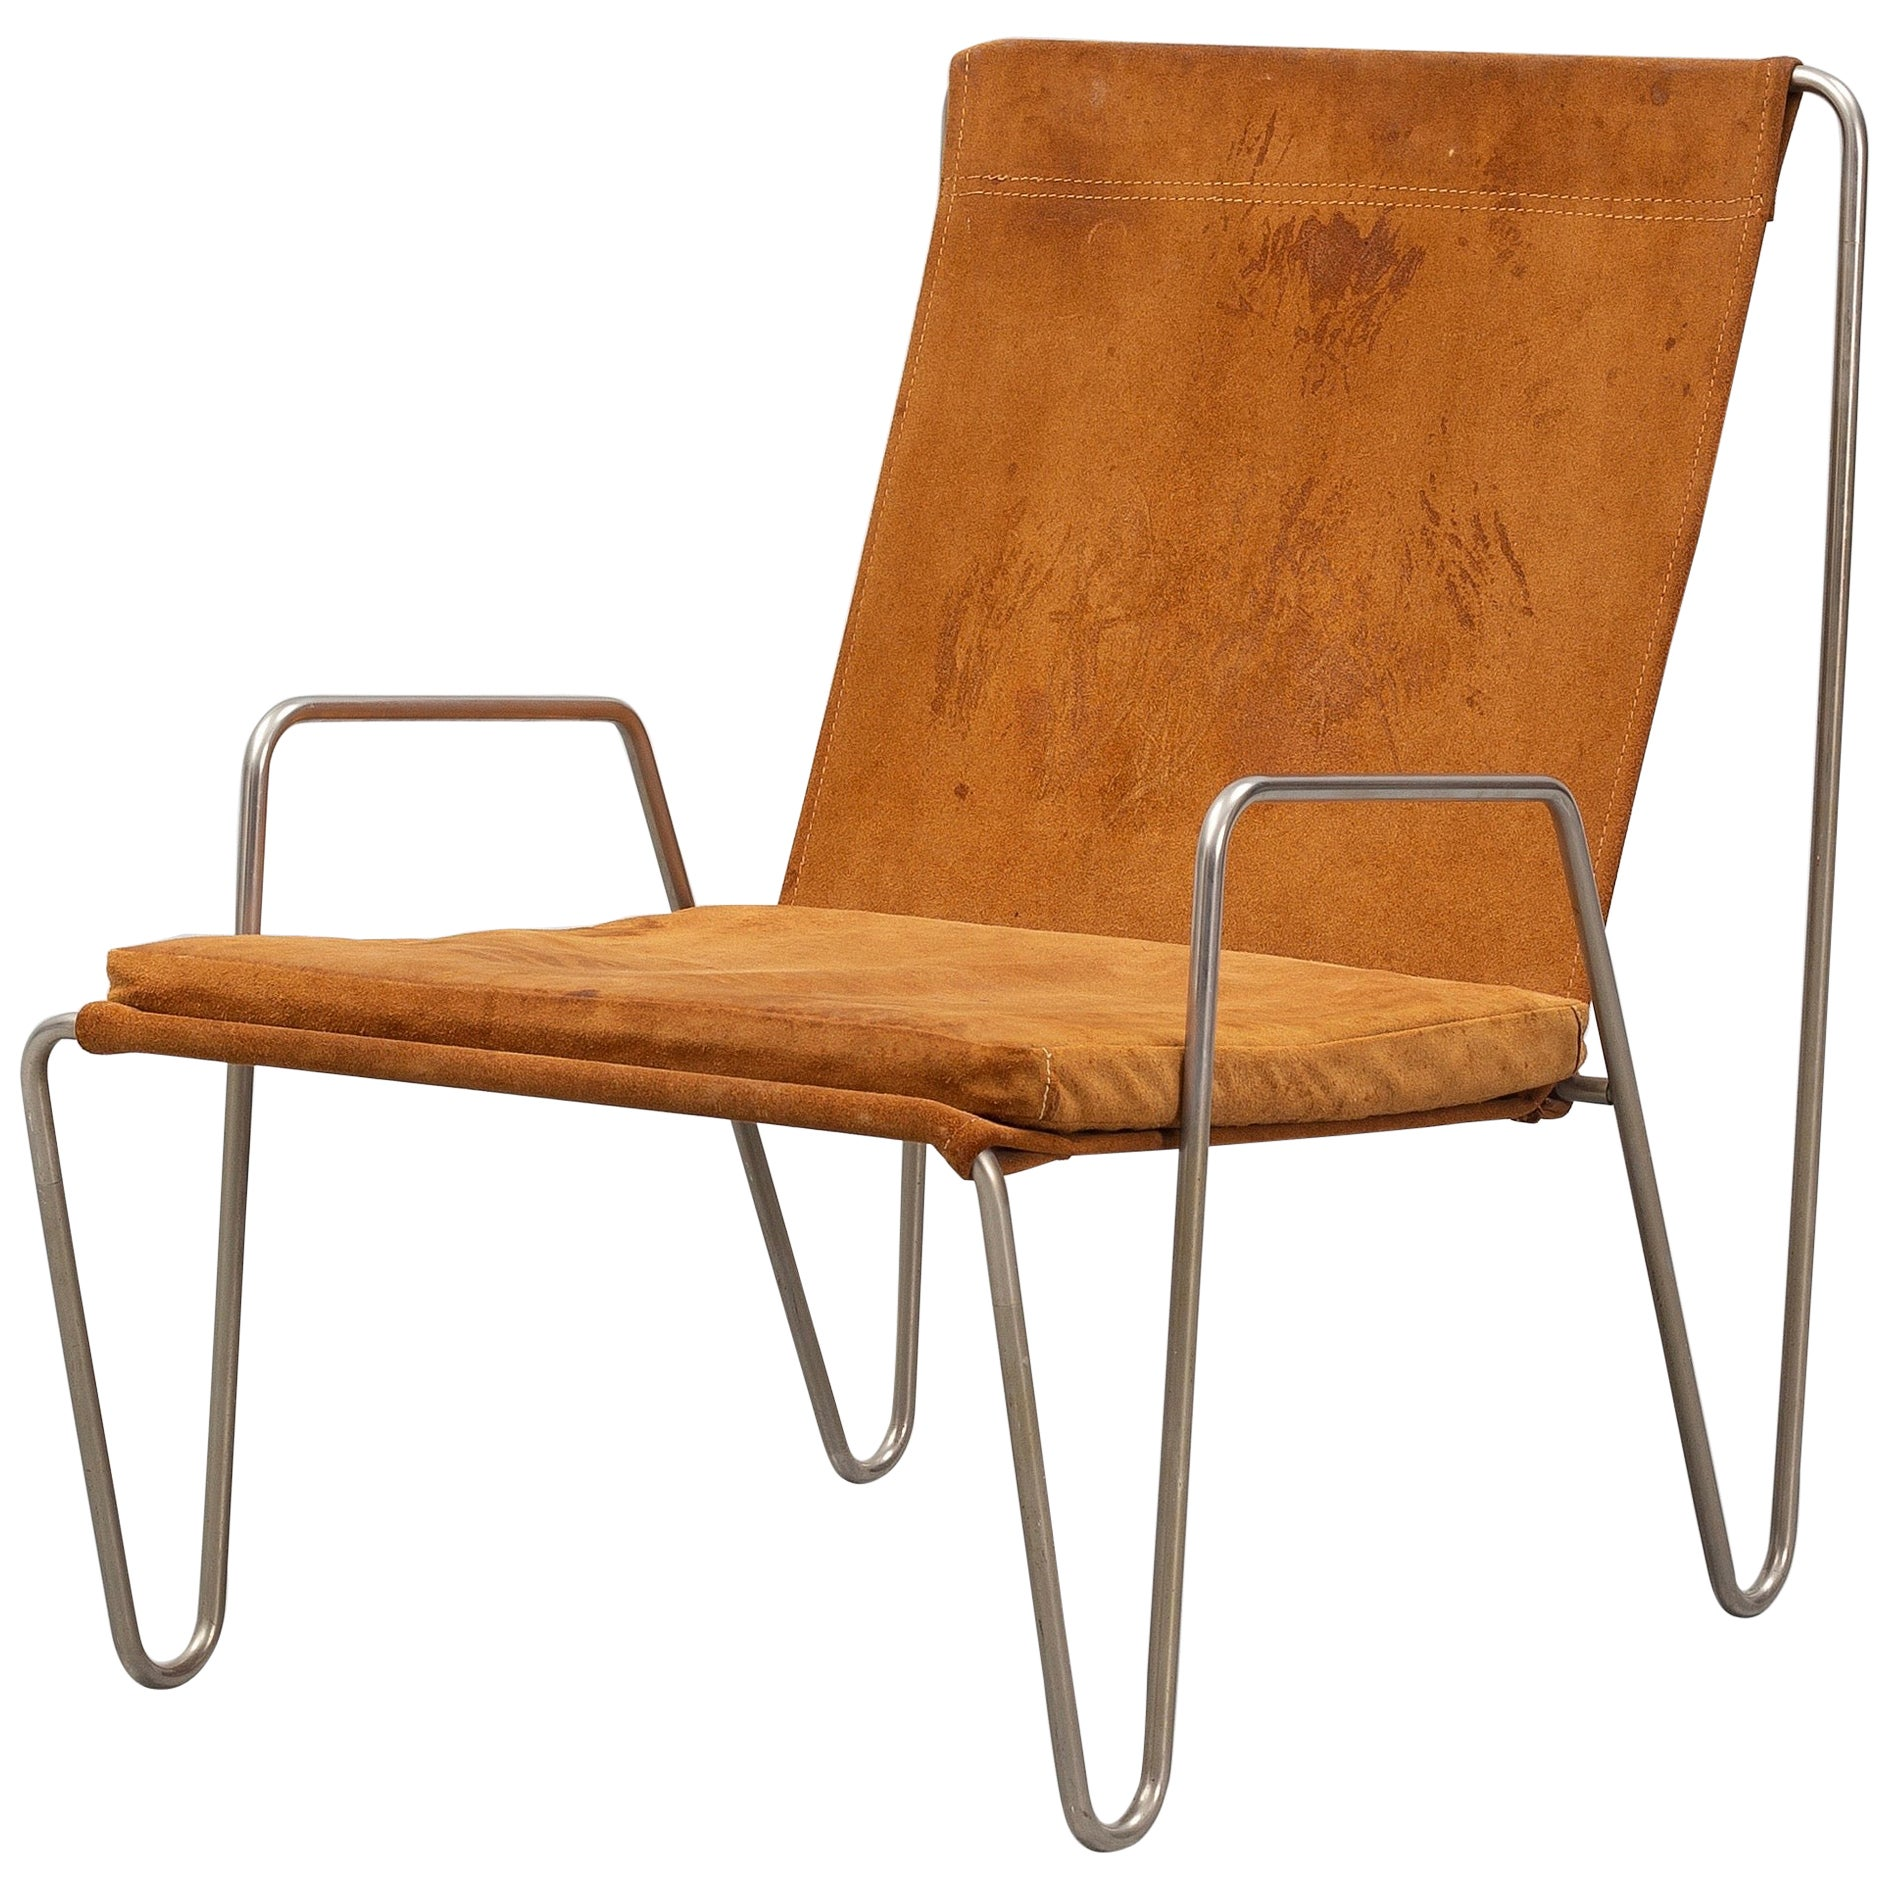 Bachelor Easy Chair by Verner Panton, Fritz Hansen, 1955